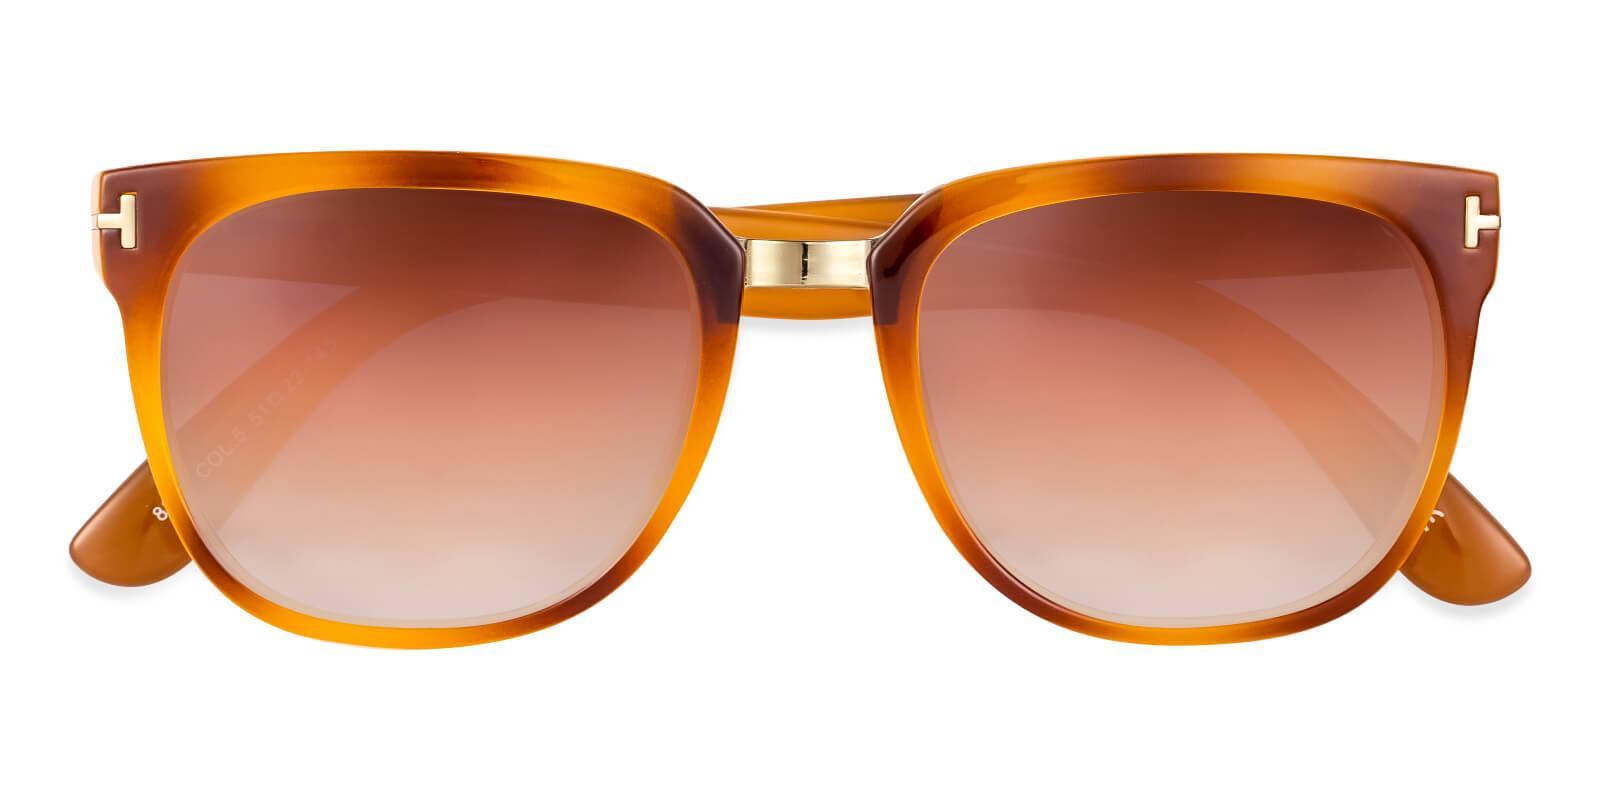 Mars Pattern Acetate Sunglasses , UniversalBridgeFit Frames from ABBE Glasses